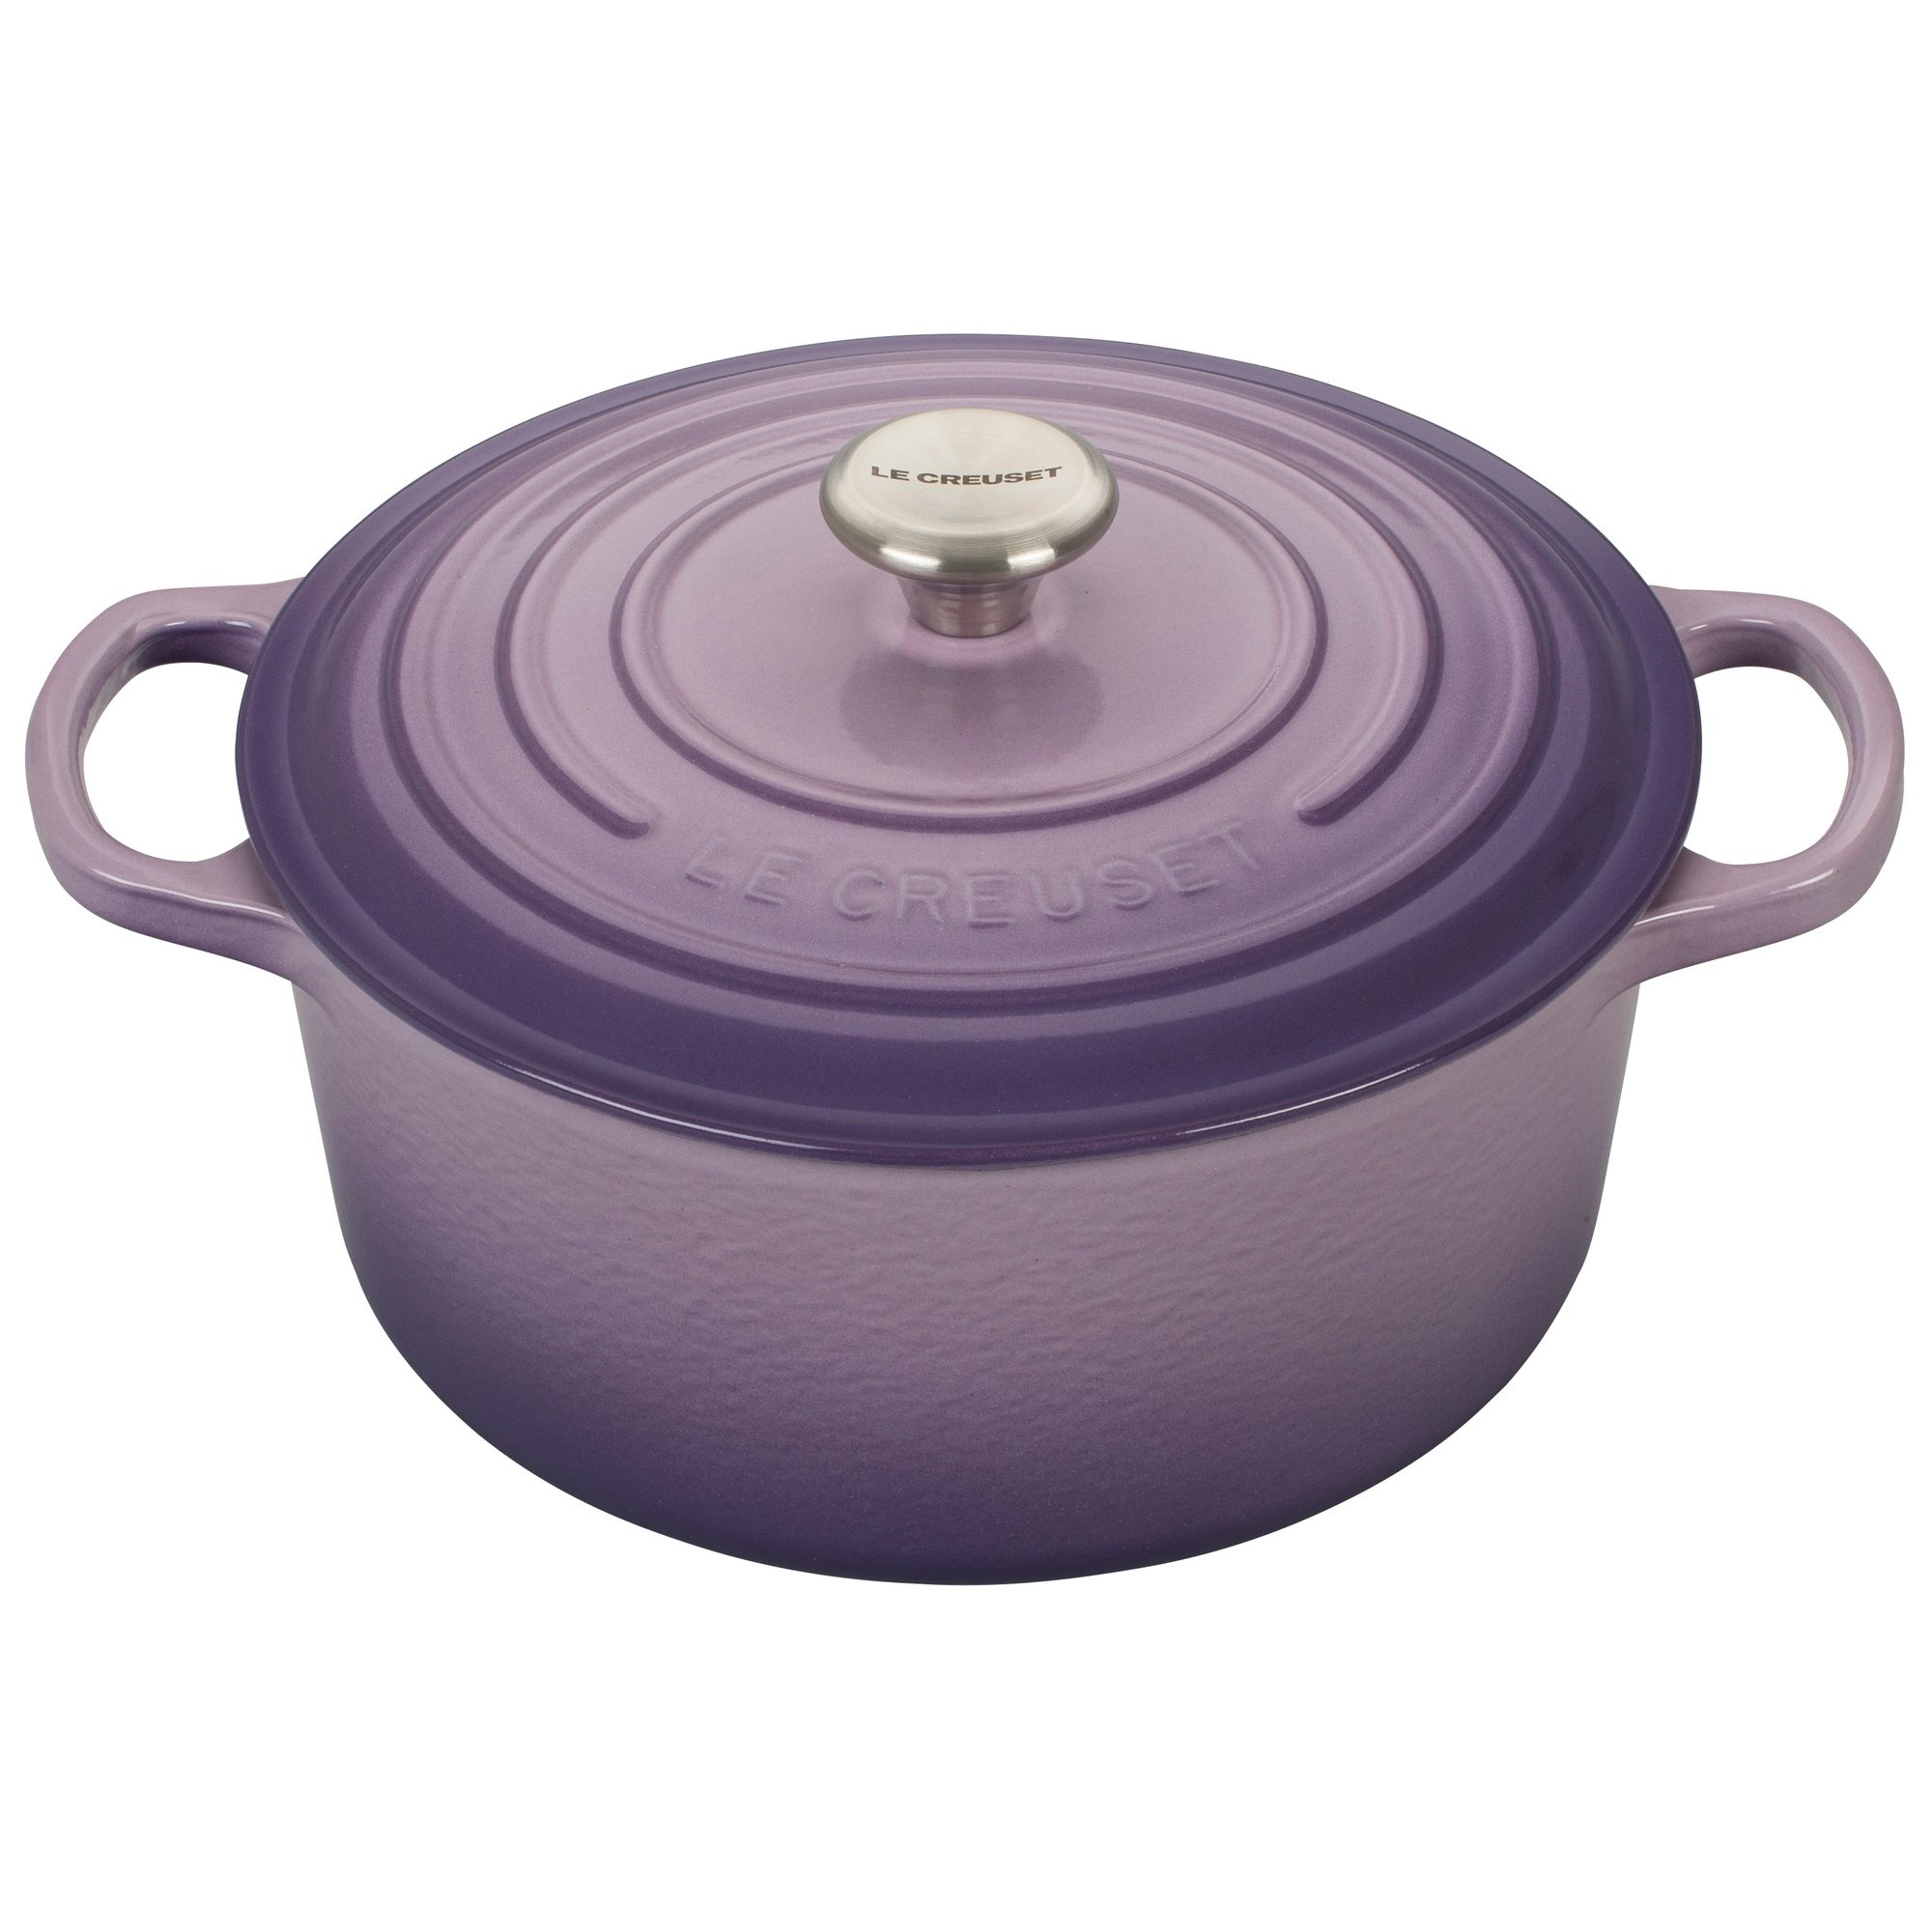 Le Creuset Signature Provence Enameled Cast Iron 3.5 Quart Round French Oven